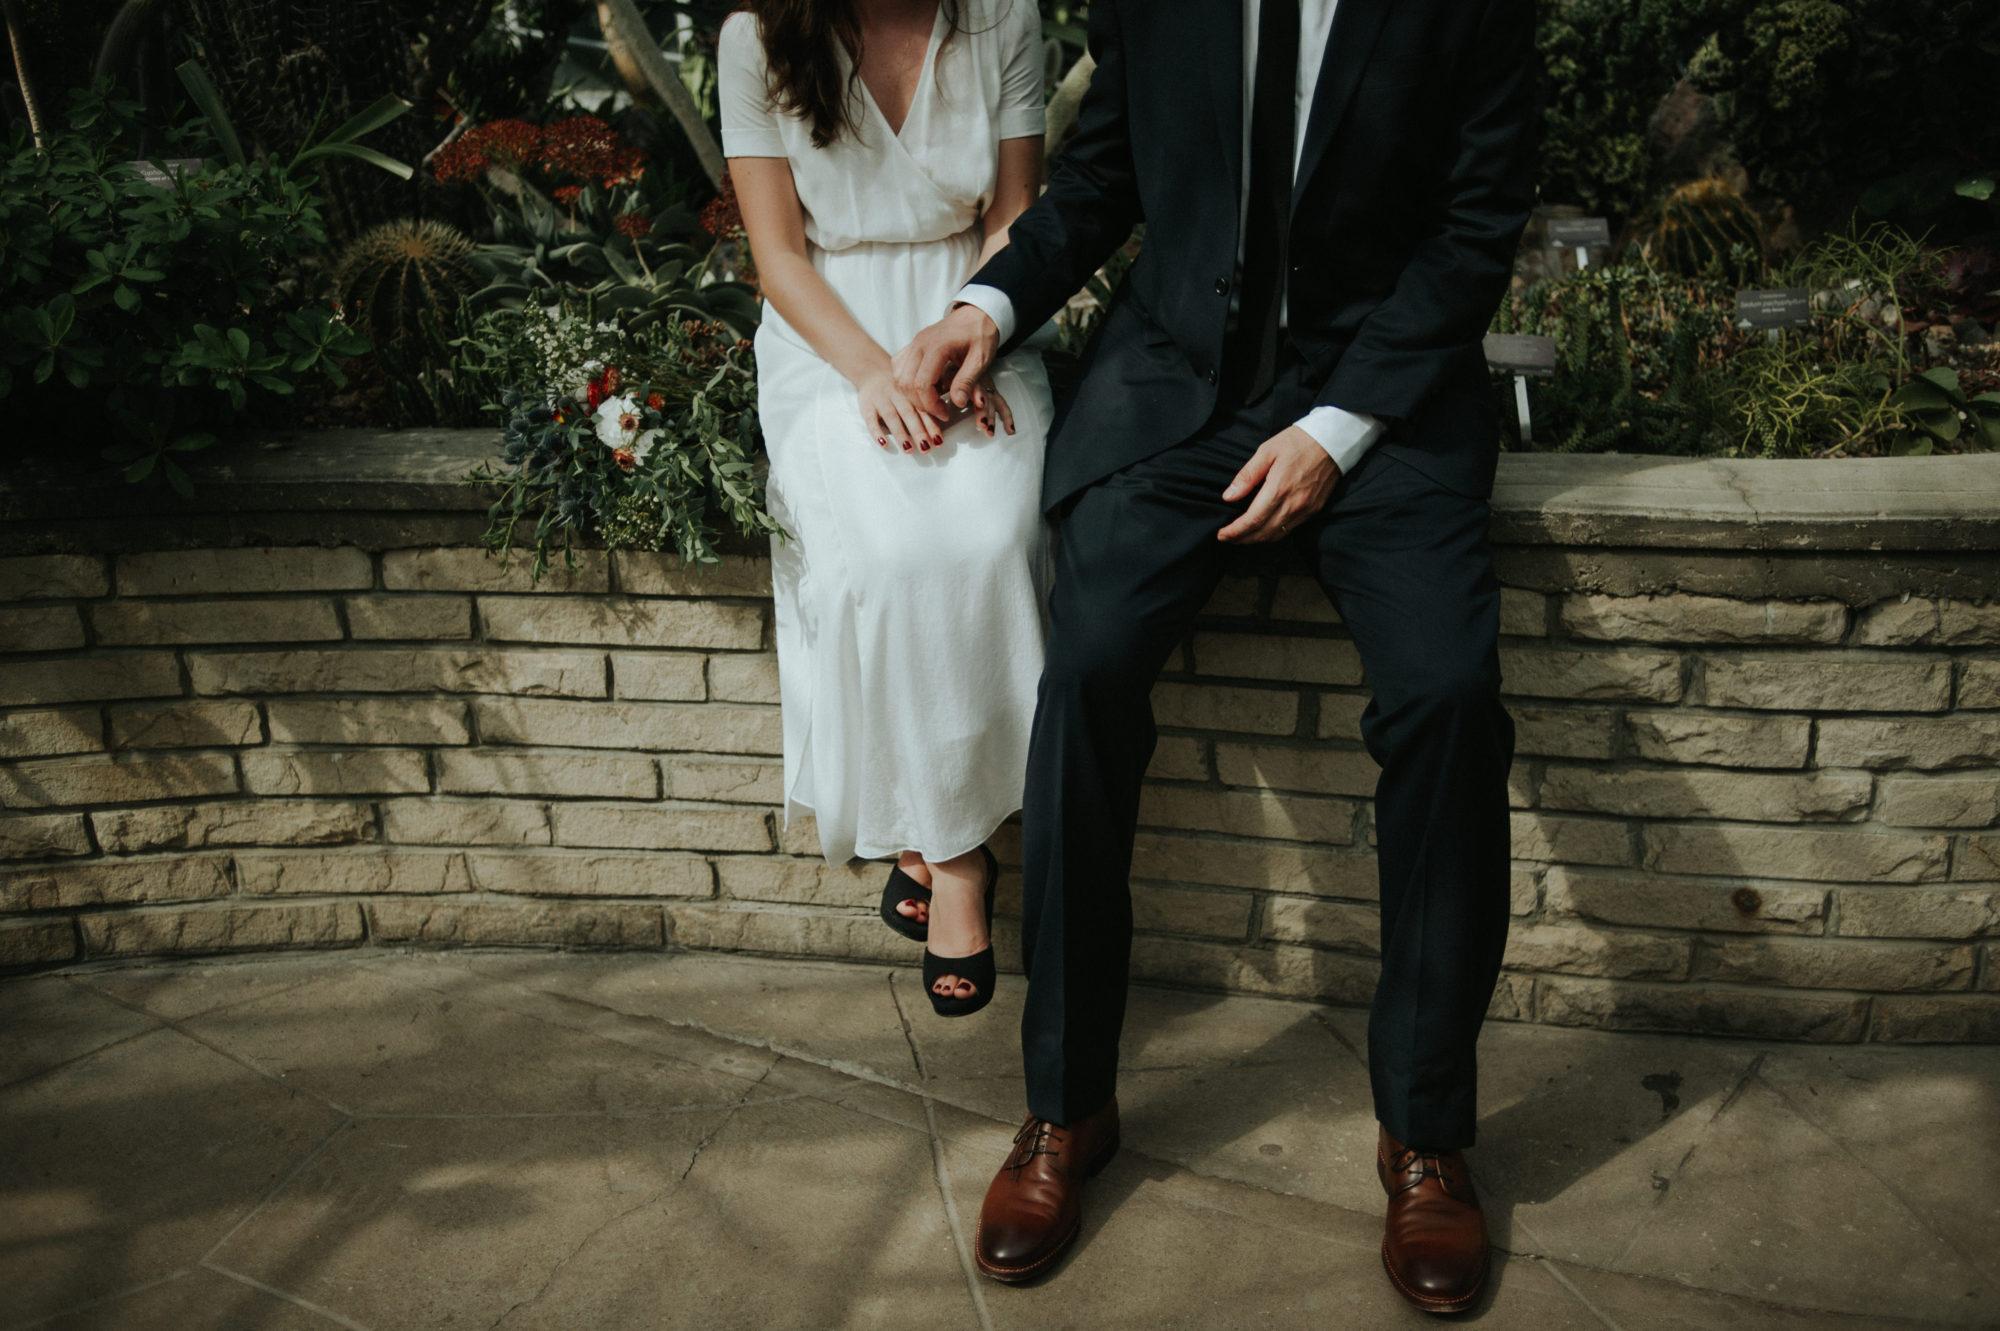 Secret elopement at Allan Gardens by Daring Wanderer // www.daringwanderer.com